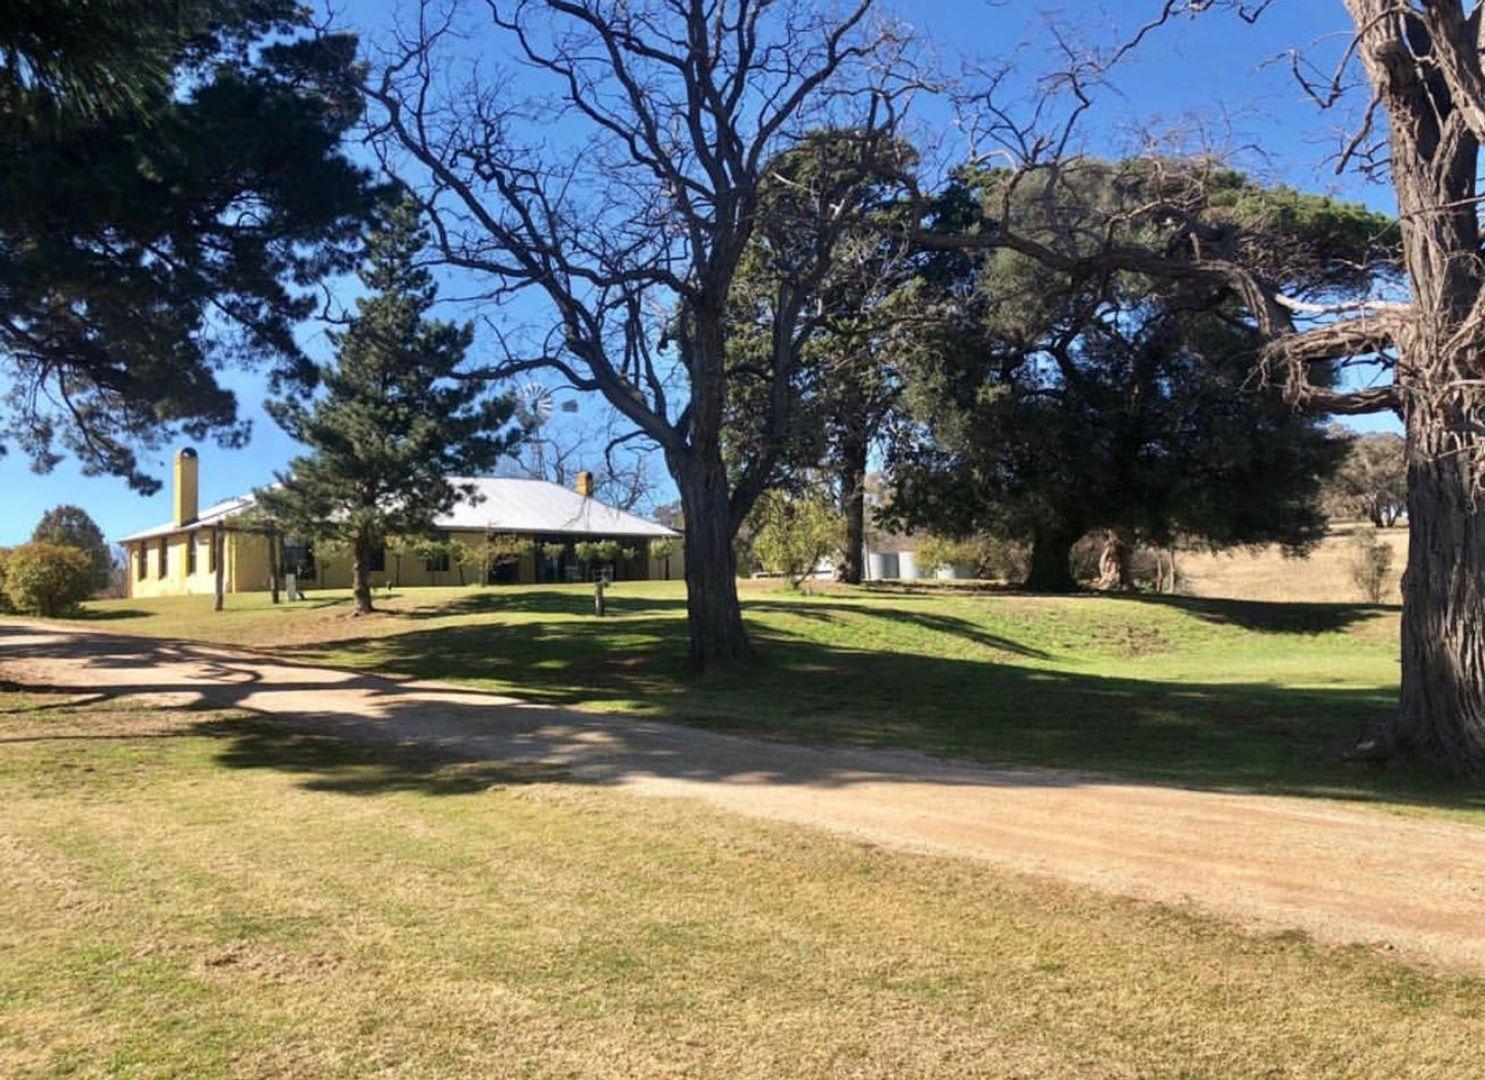 3118FH Brewongle Lane, Brewongle NSW 2795, Image 0